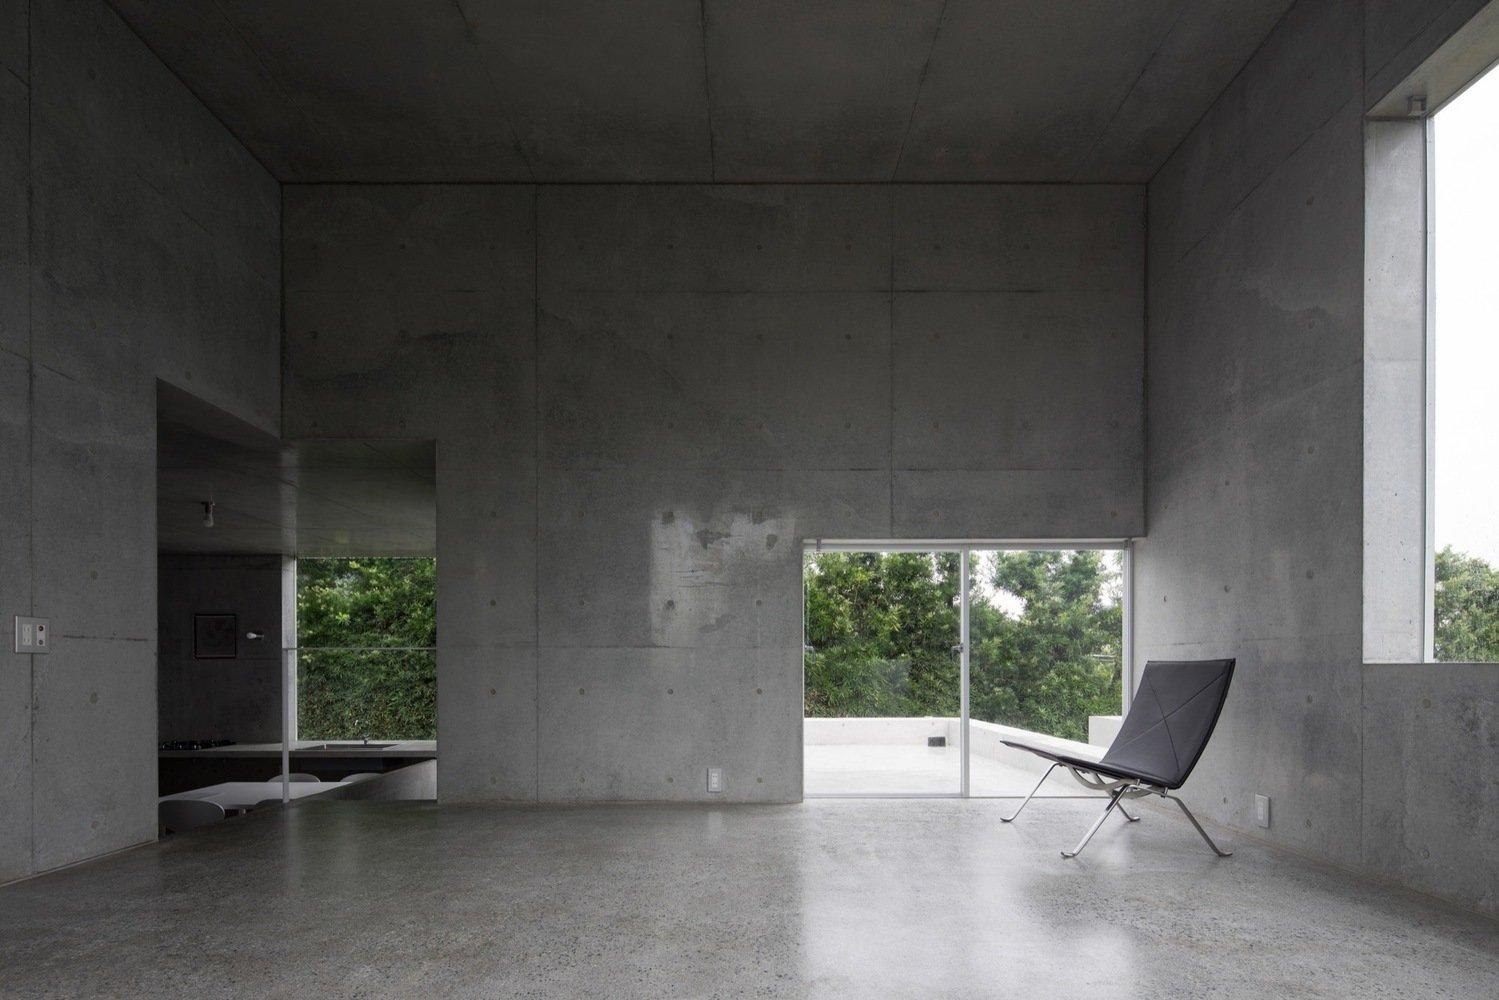 Photo 2 of 6 in House in Akitsu by Kazunori Fujimoto Architect & Associates